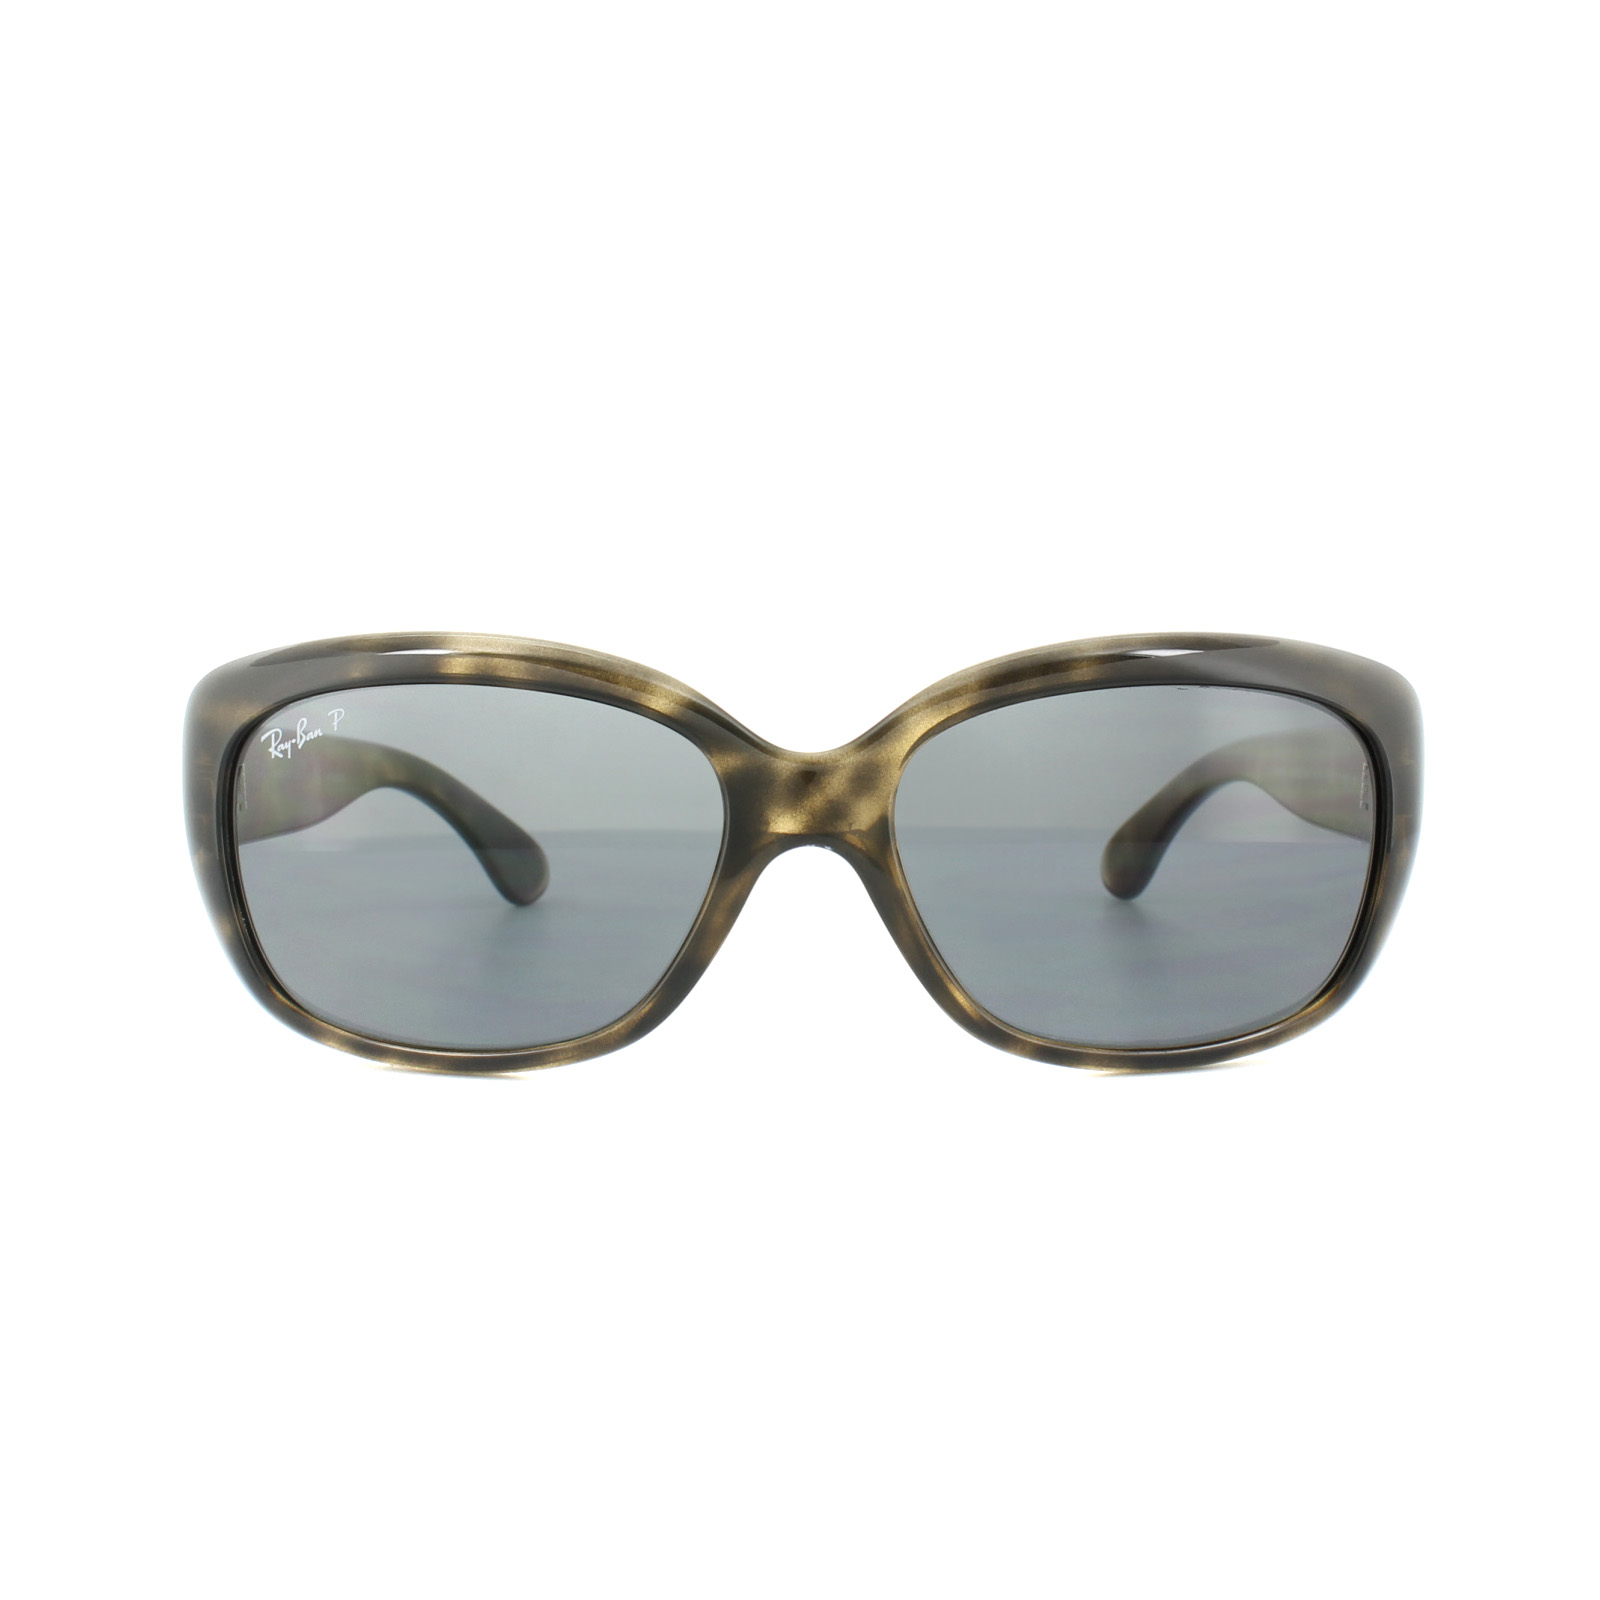 0d2eab5b32b Sentinel Ray-Ban Sunglasses Jackie Ohh 4101 731 81 Tortoise Grey Gradient  Polarized